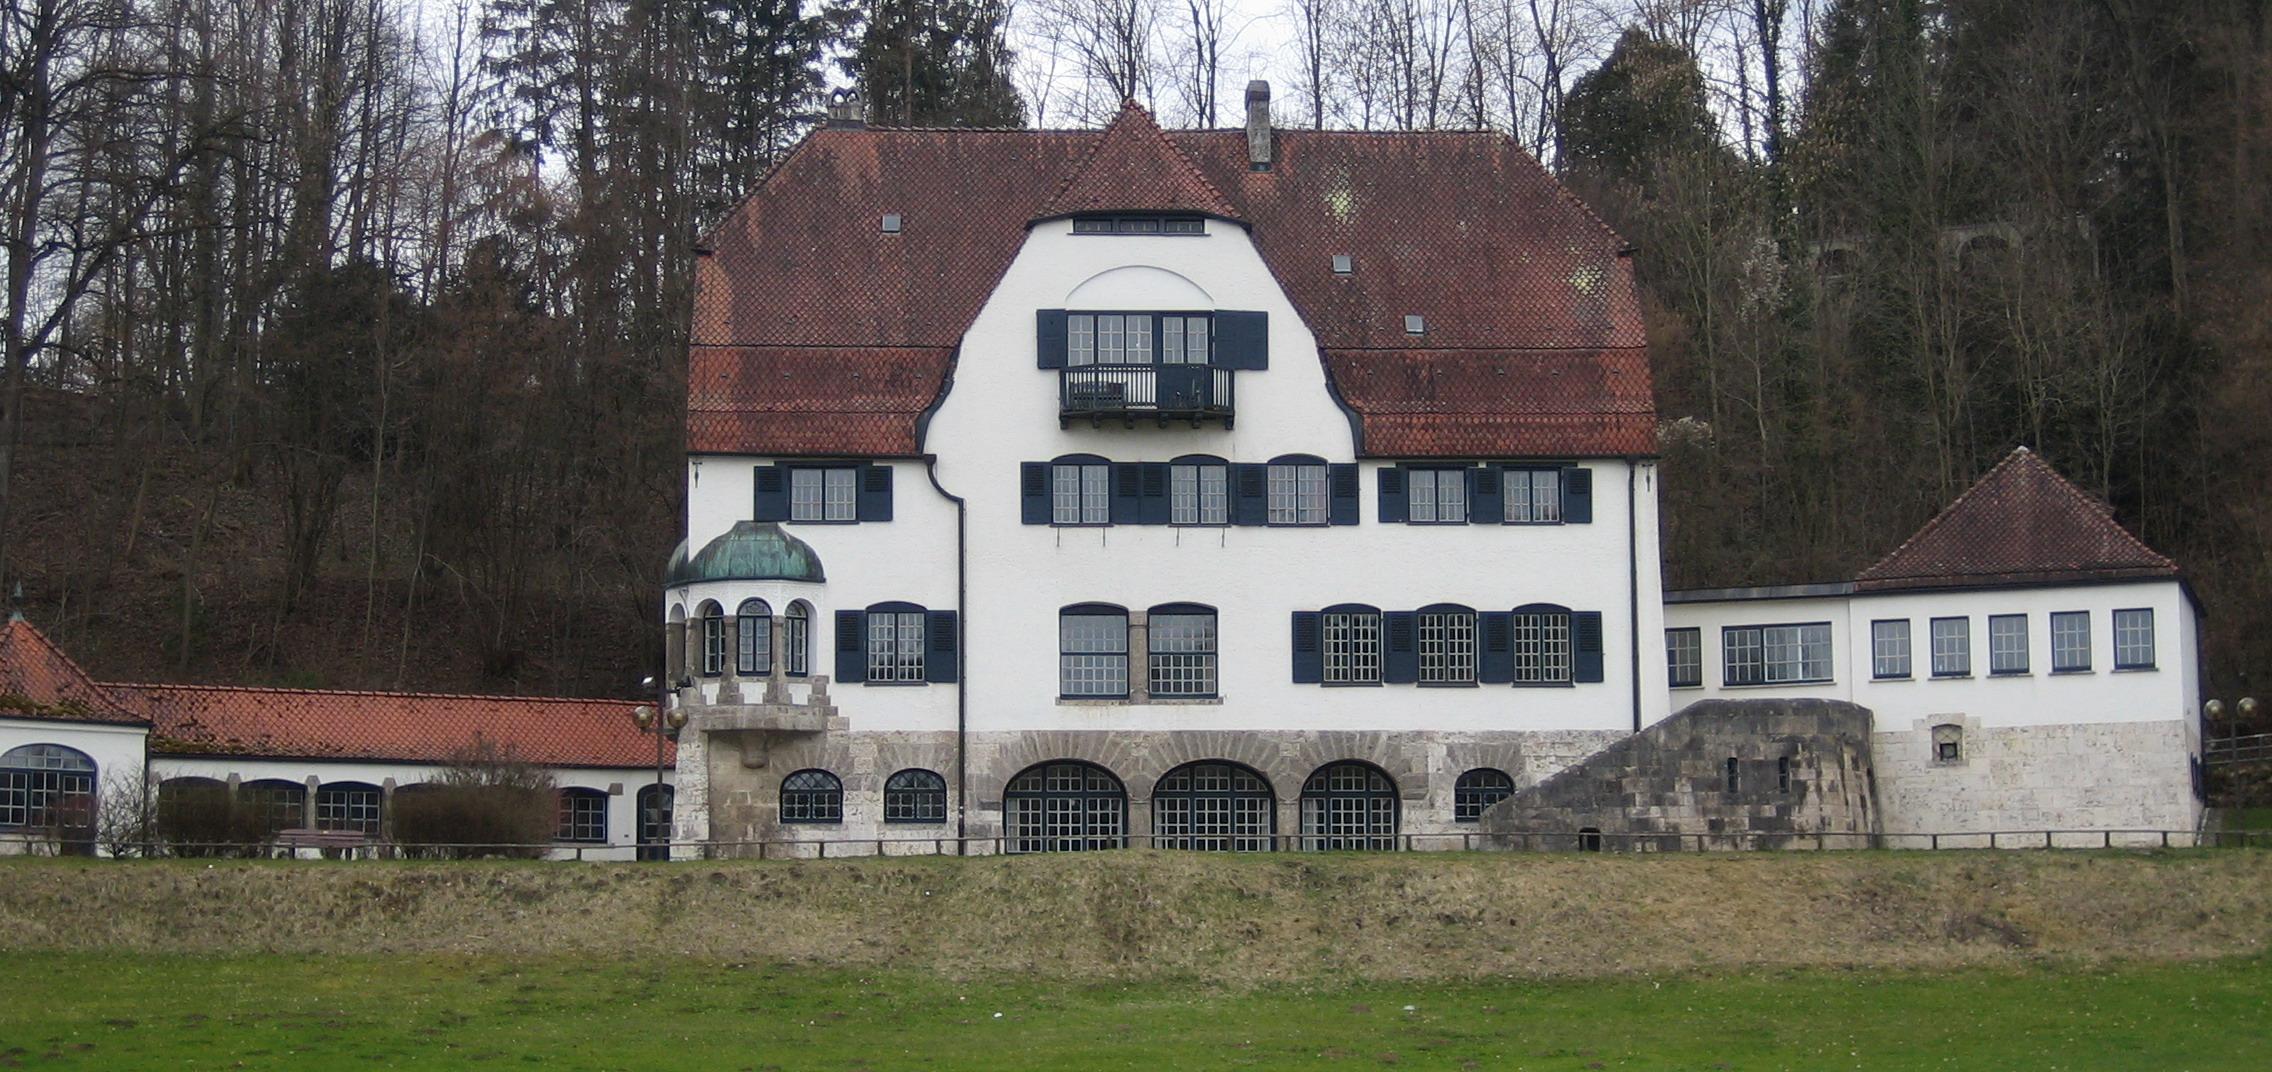 File:Herrlingen Villa Lindenhof.jpg - Wikimedia Commons